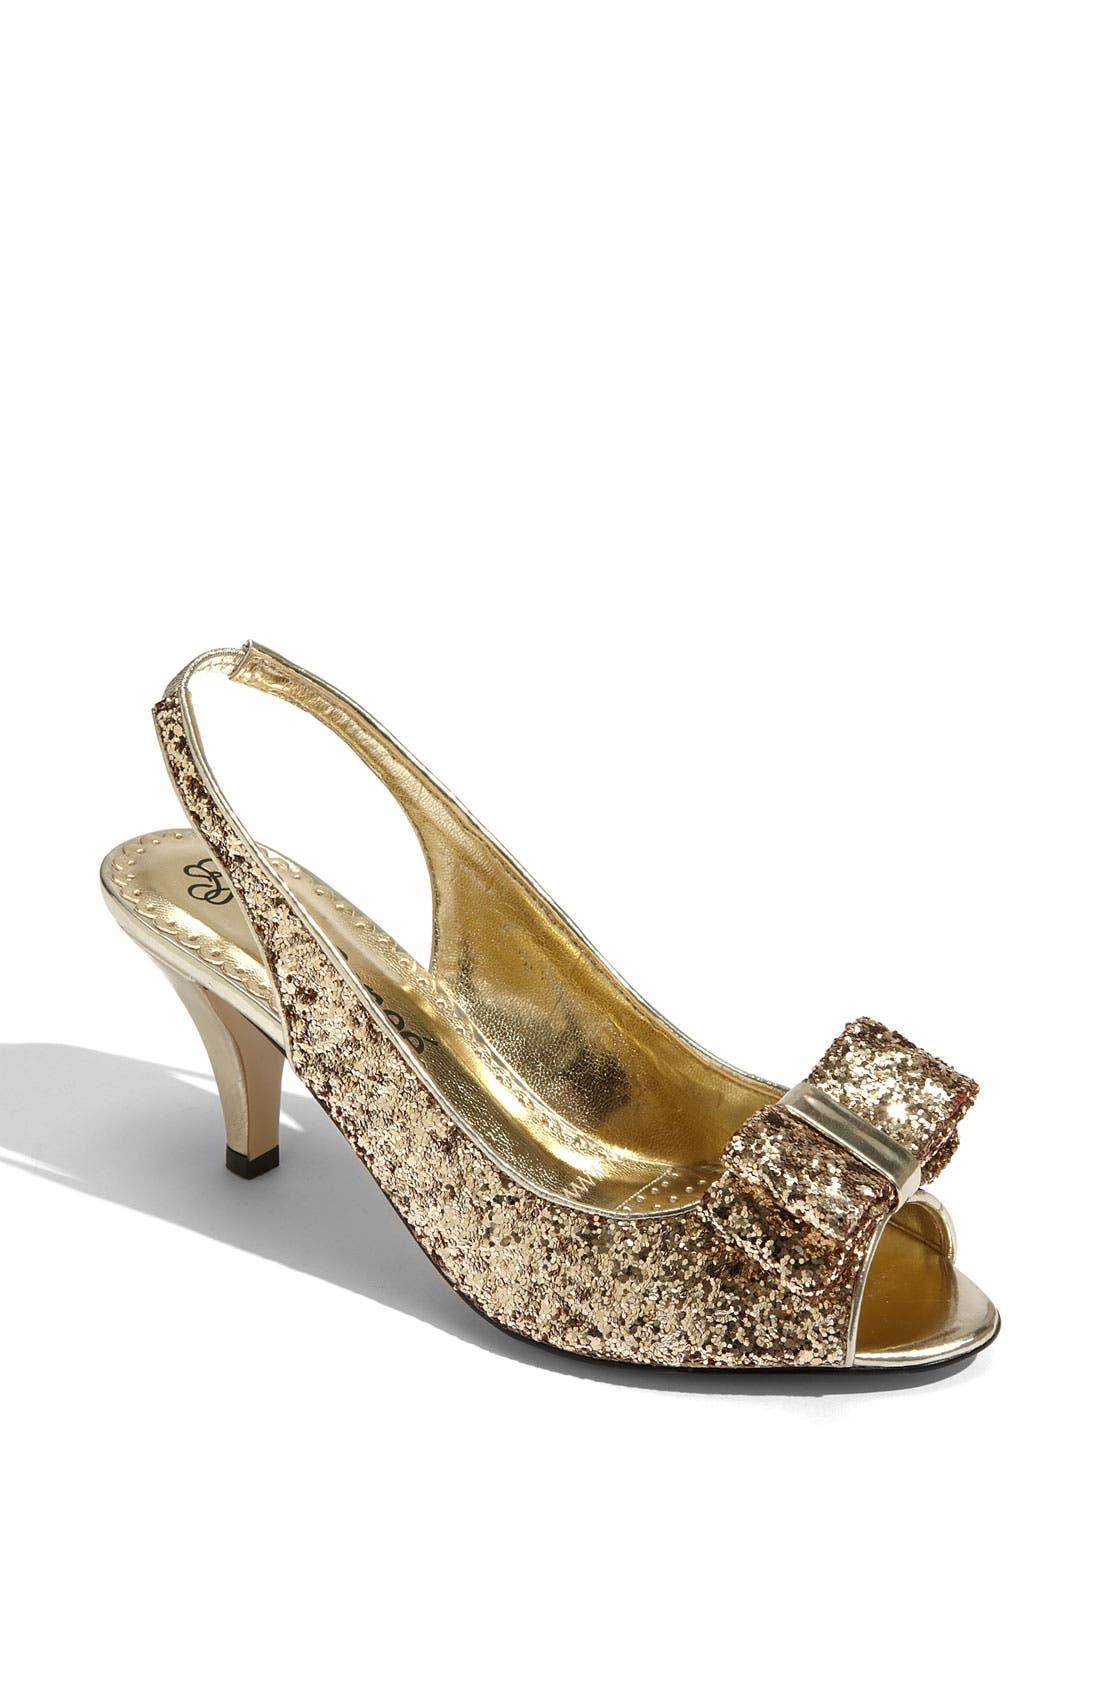 Alternate Image 1 Selected - J. Reneé 'Rosina' Sandal